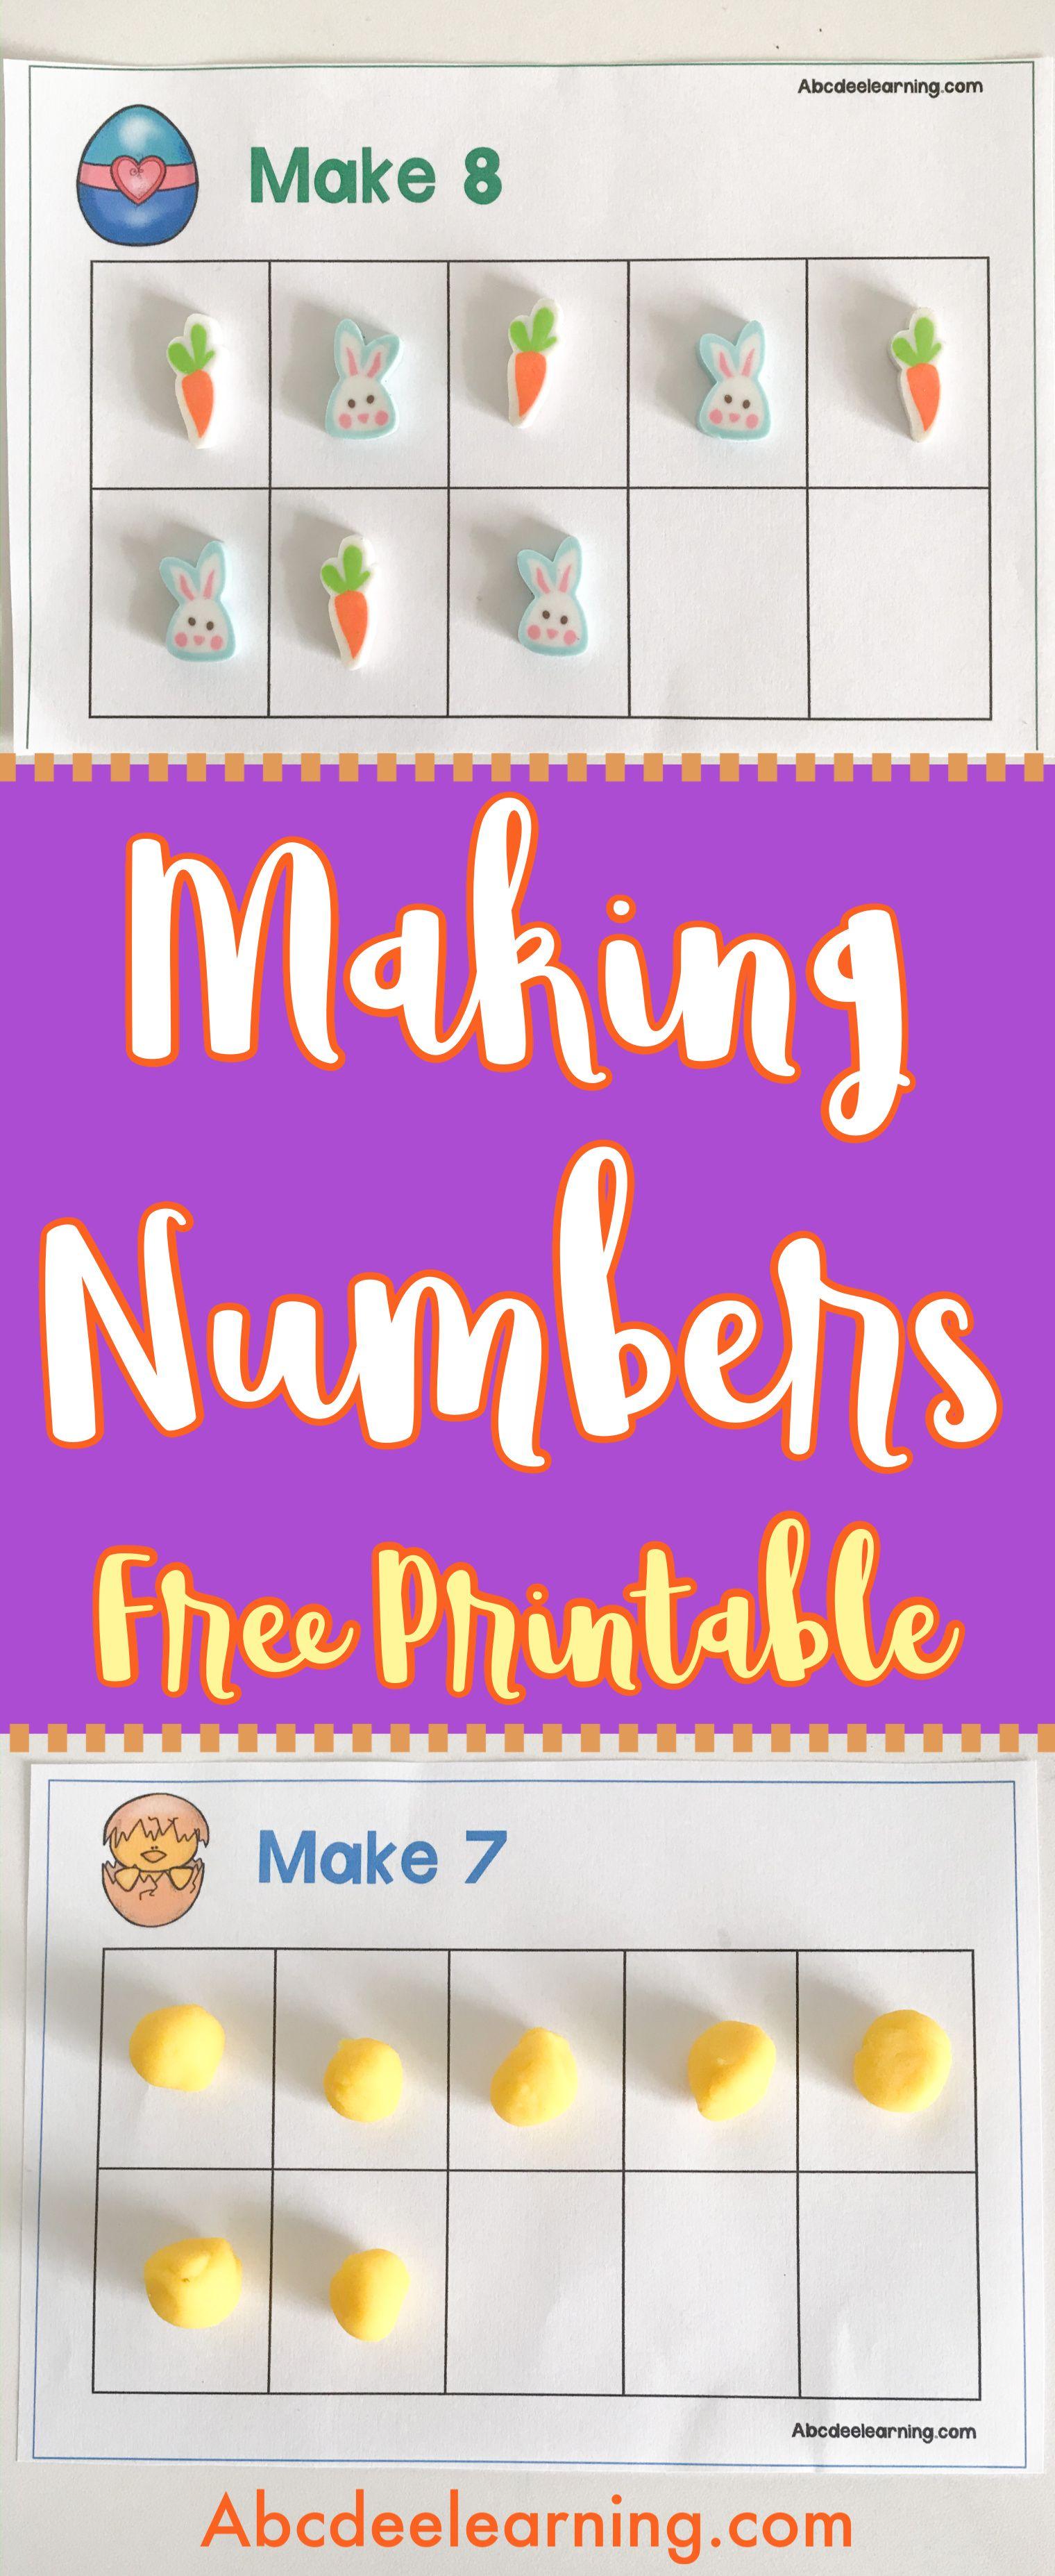 Free Easter 10 Frame Making Number Cards In 2020 Worksheets For Kids Do A Dot Dot Markers [ 3710 x 1520 Pixel ]